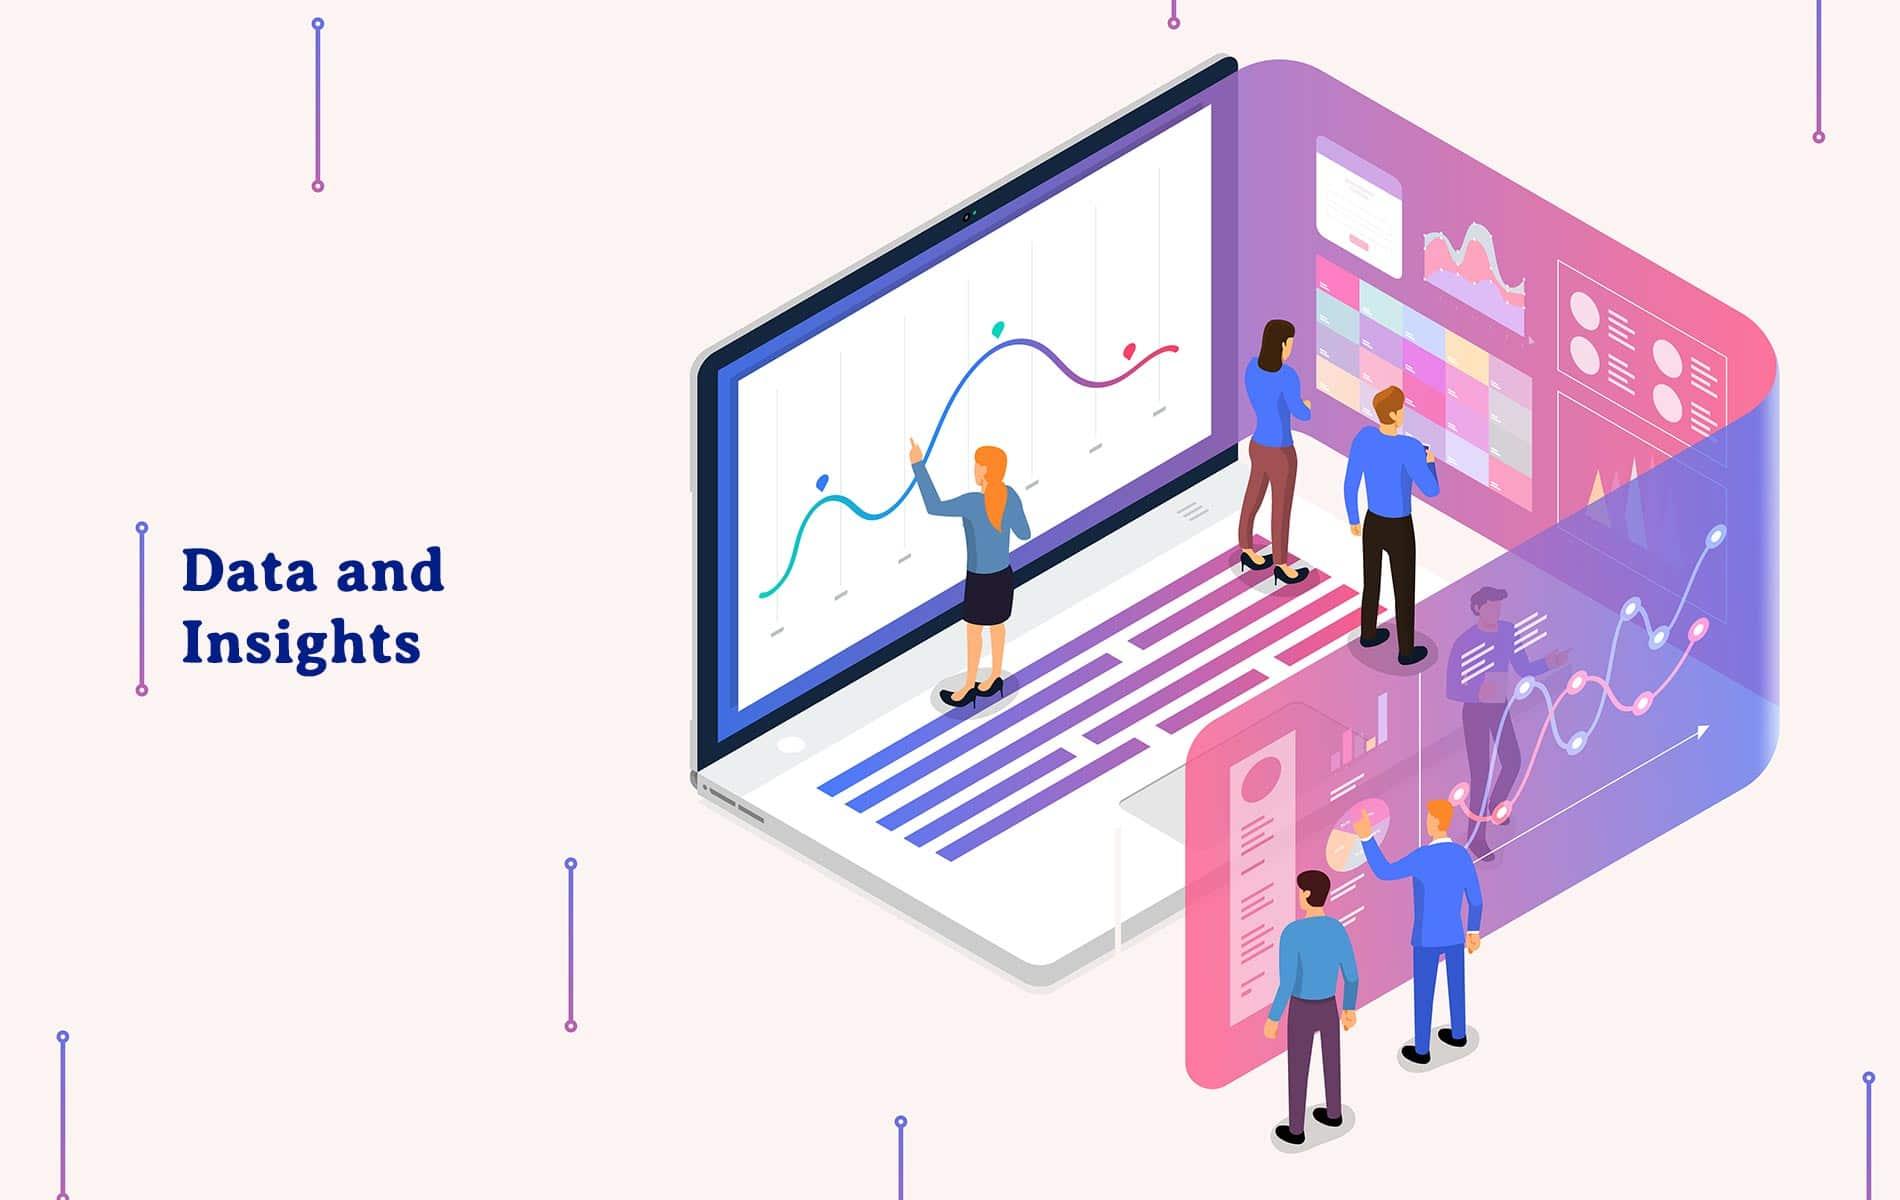 Data insights and analytics